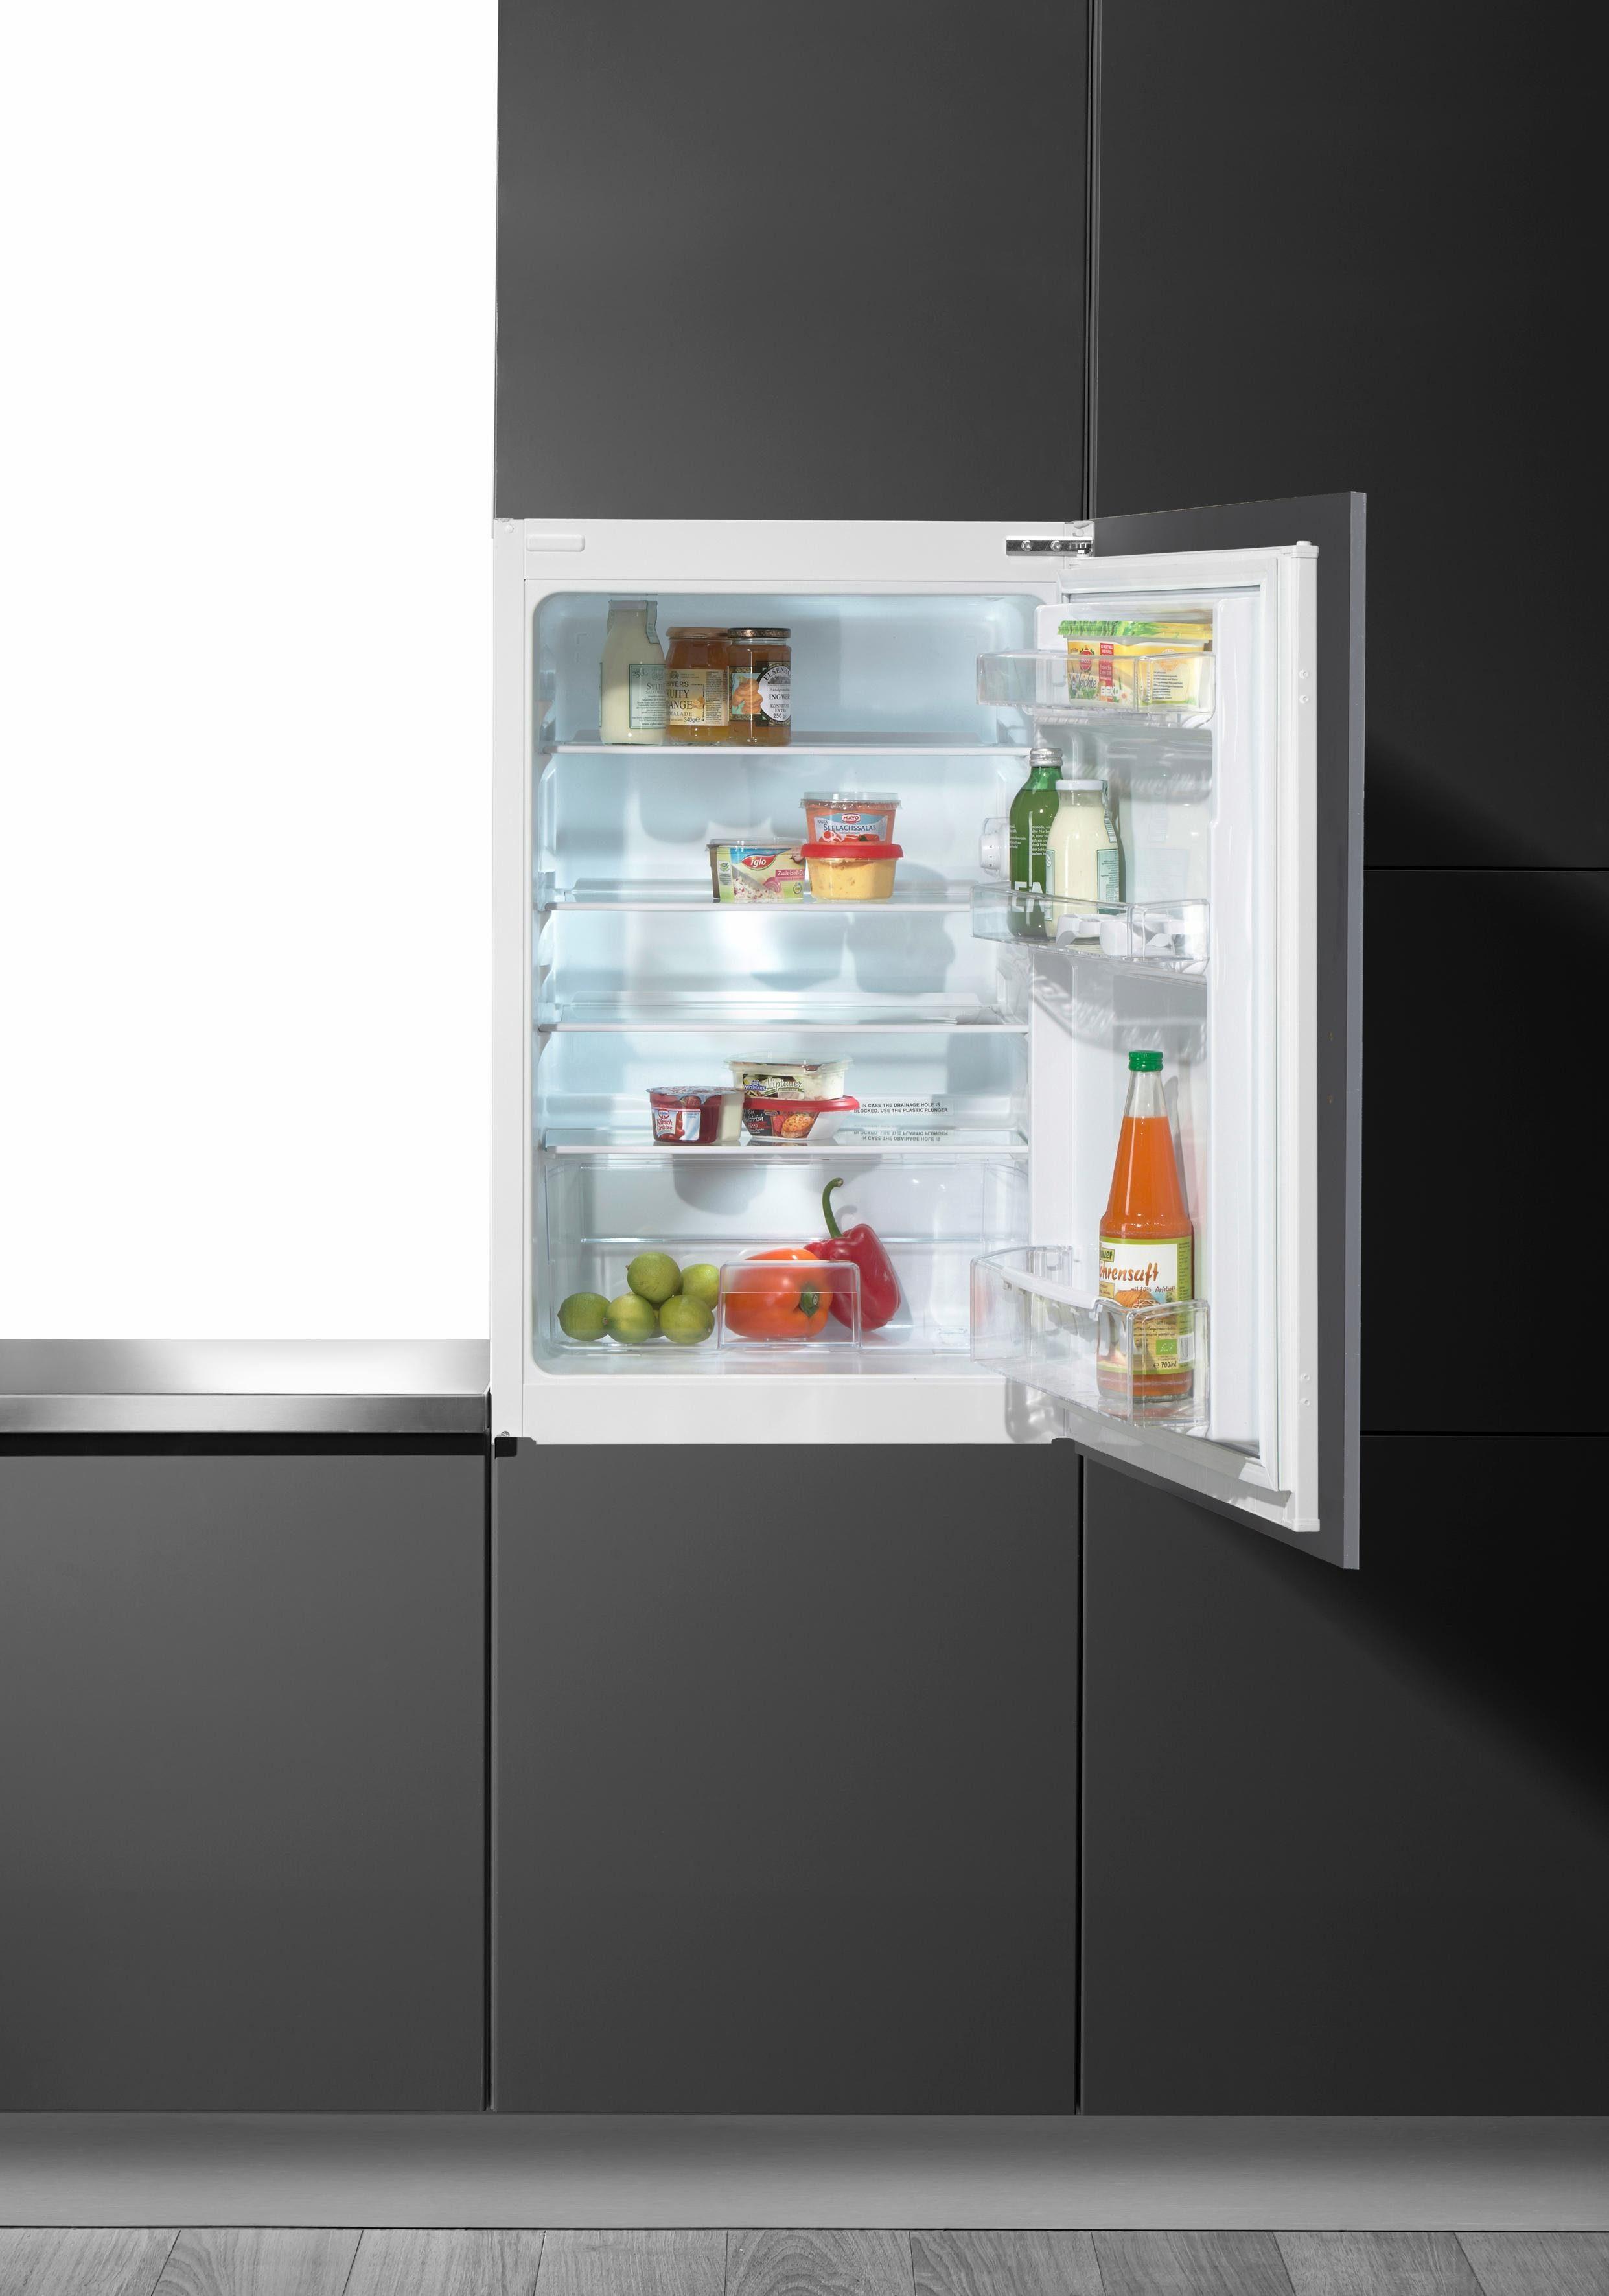 Beko integrierbarer Einbaukühlschrank »B 1801«, A+, 86 cm